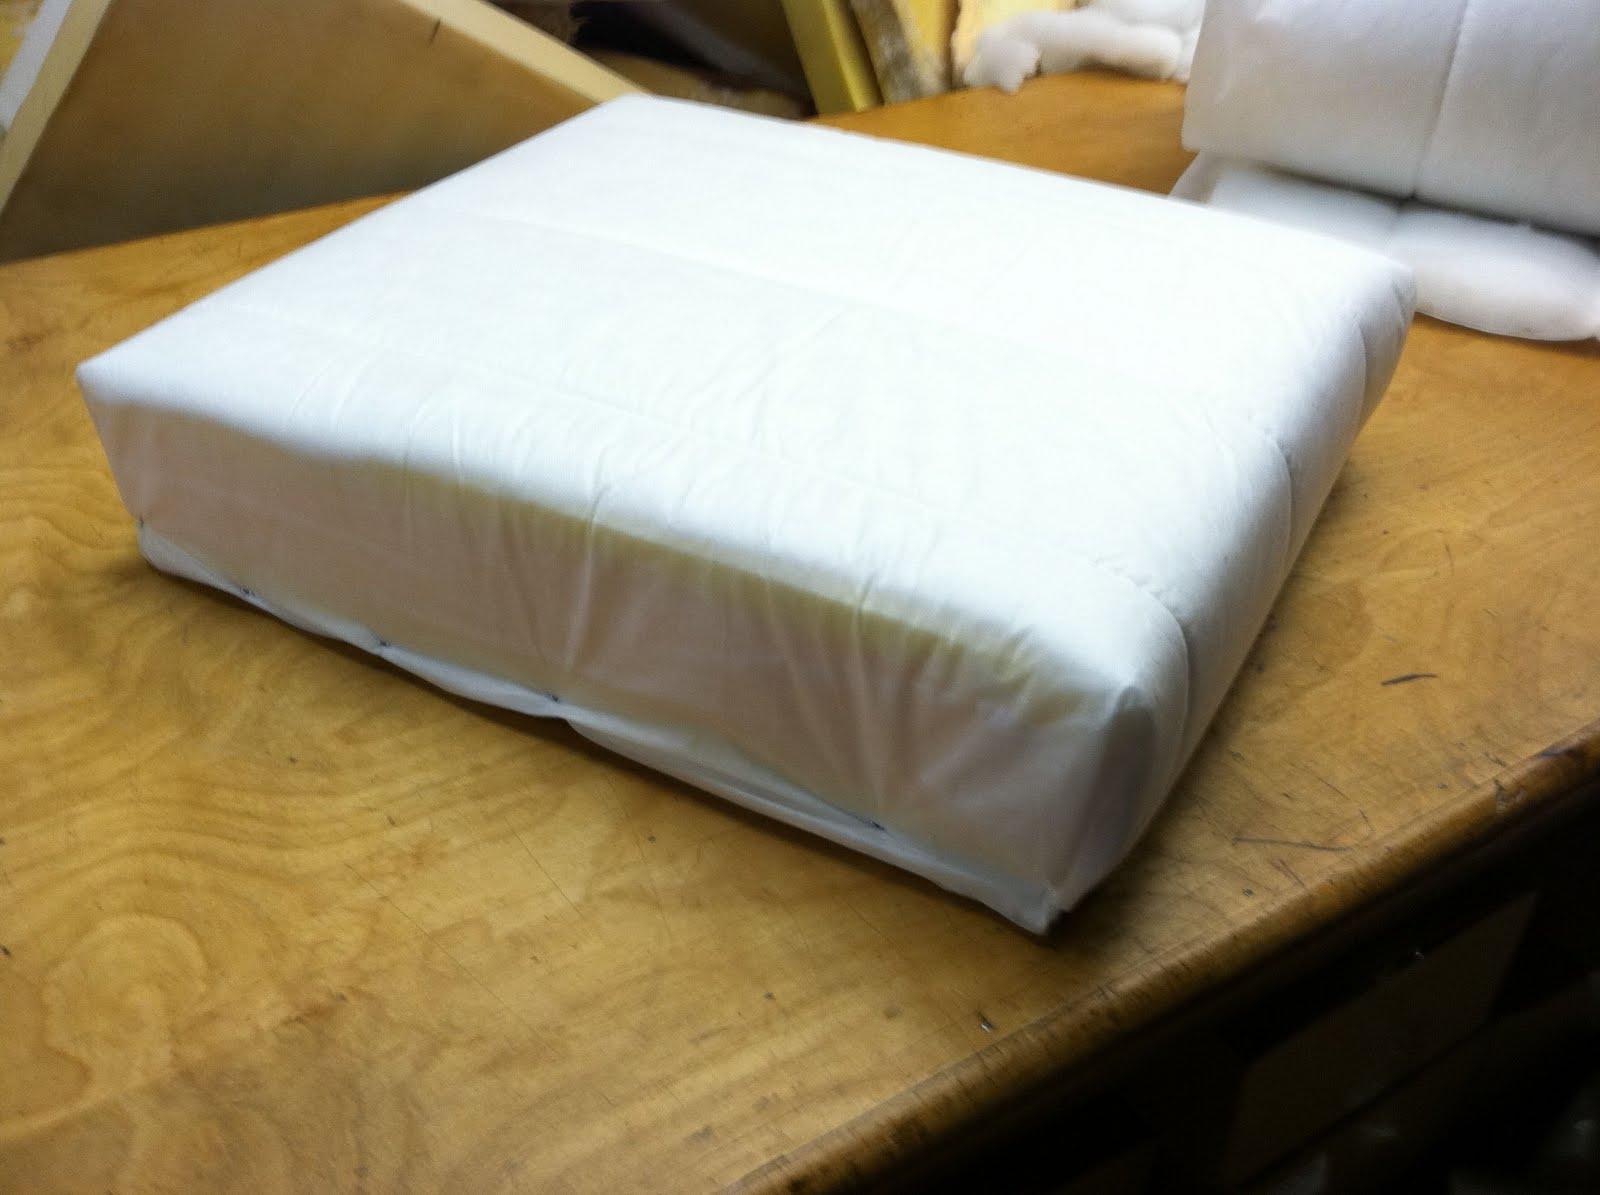 Wrap Foam Spring Unit With Dacron 91 Sewn One Side